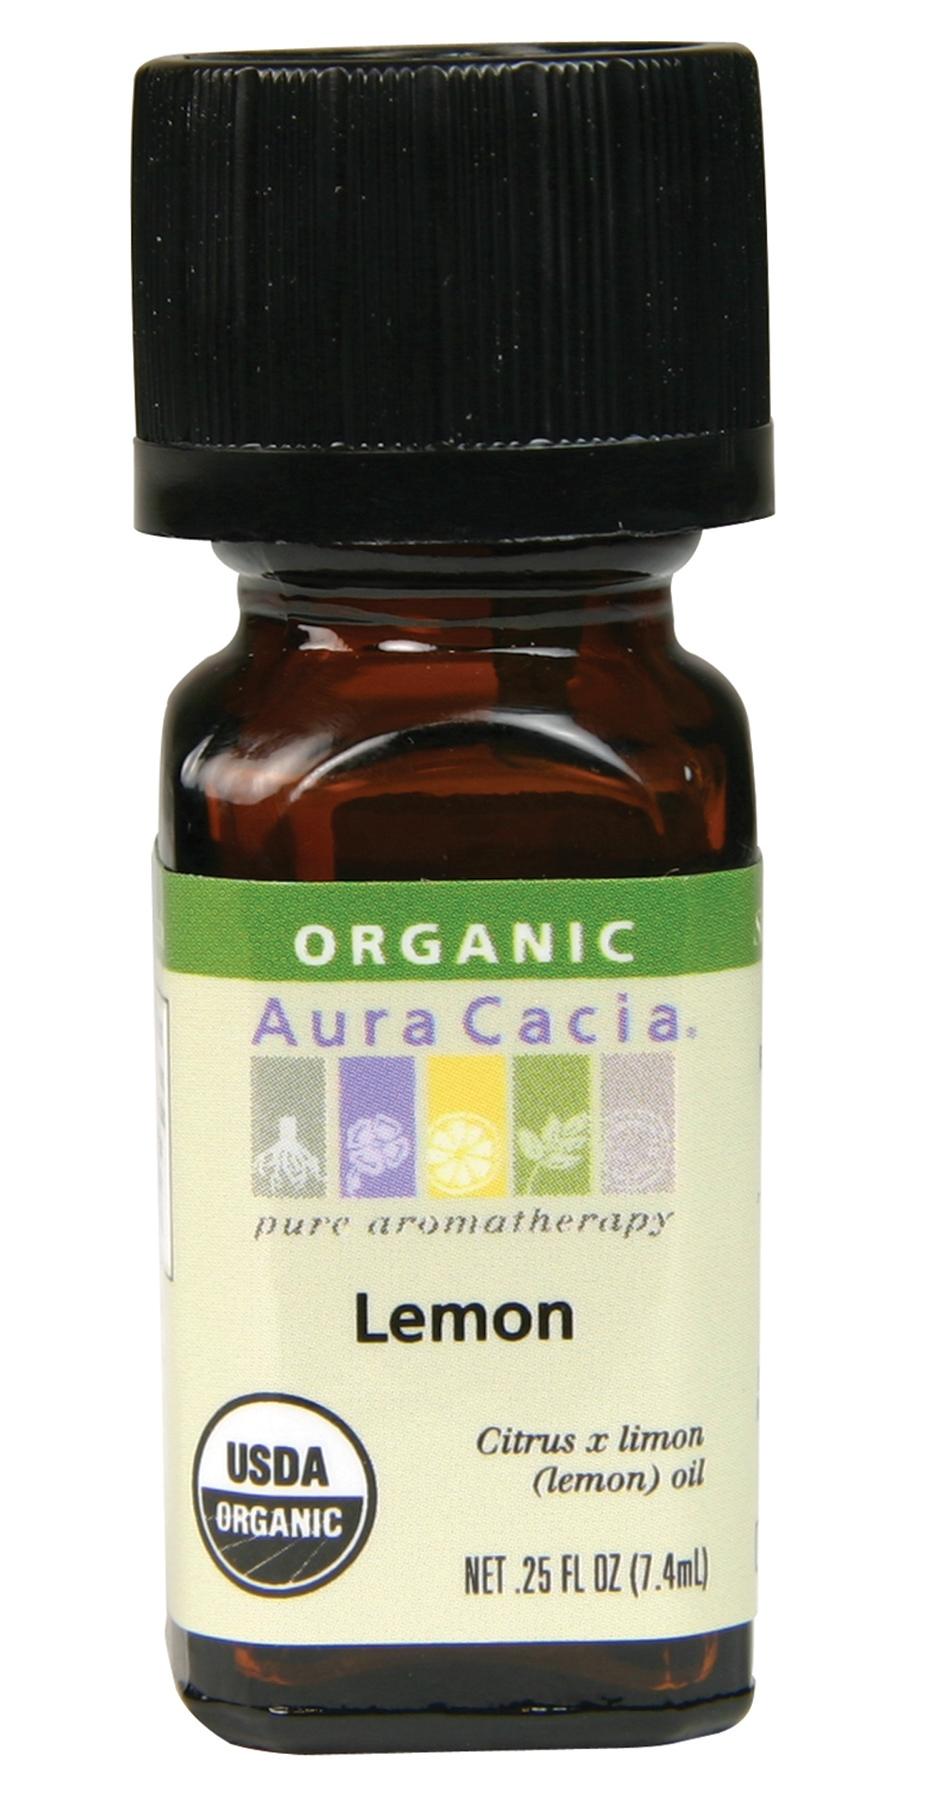 Aura Cacia Organic Lemon Essential Oil 7.4ml   BuyWell ...